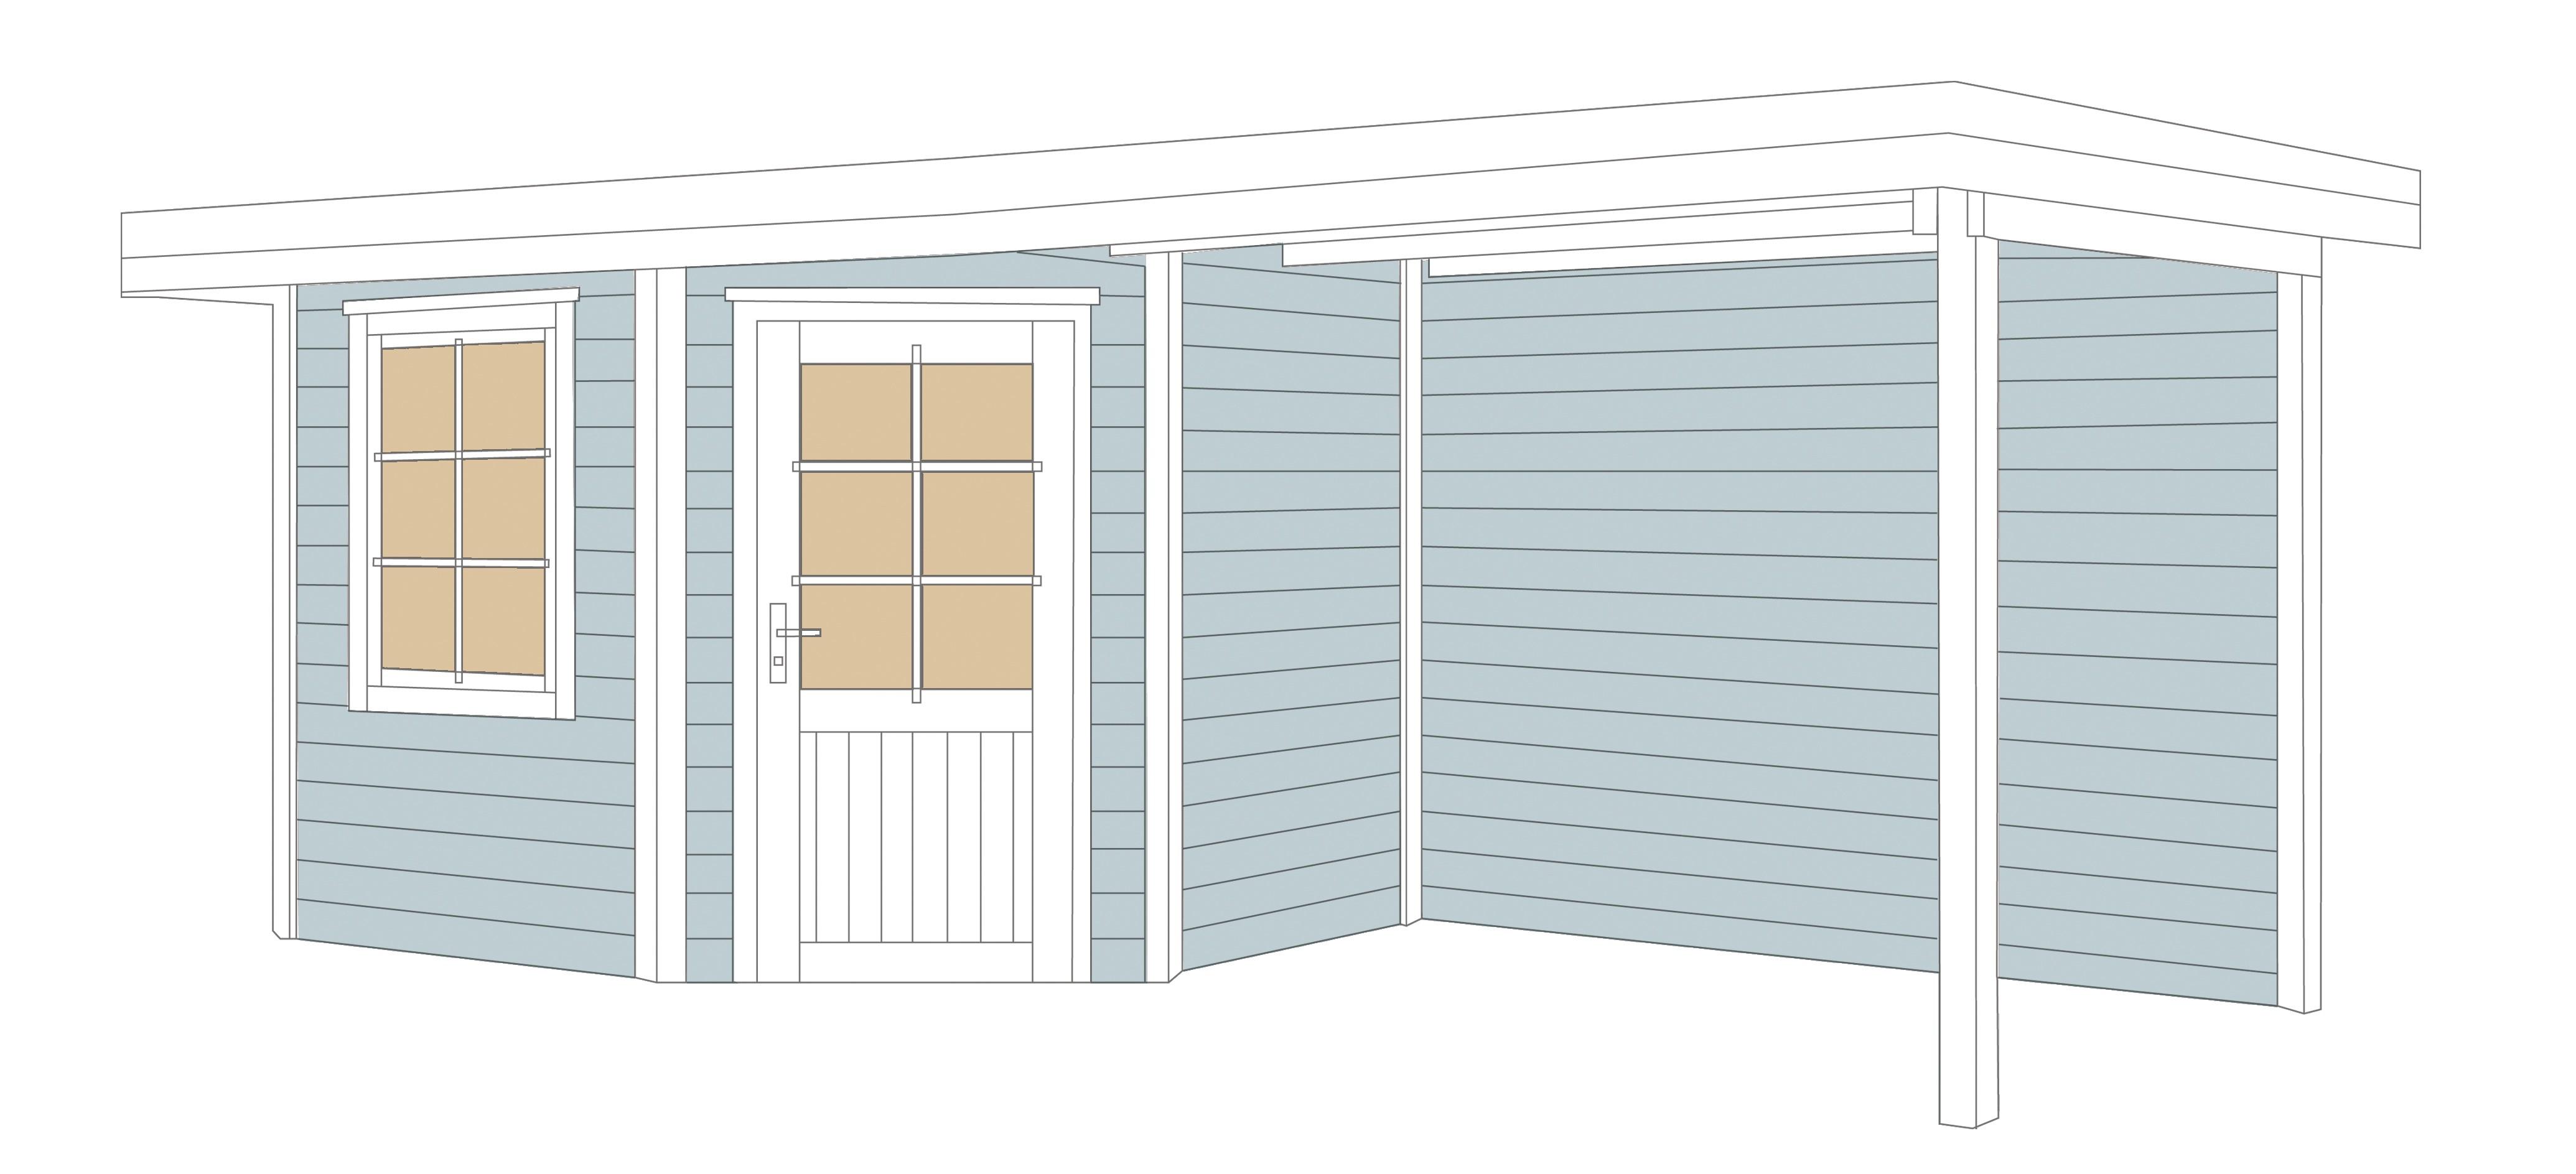 weka gartenhaus 28 mm designhaus 213b gr 1 anbau grau. Black Bedroom Furniture Sets. Home Design Ideas